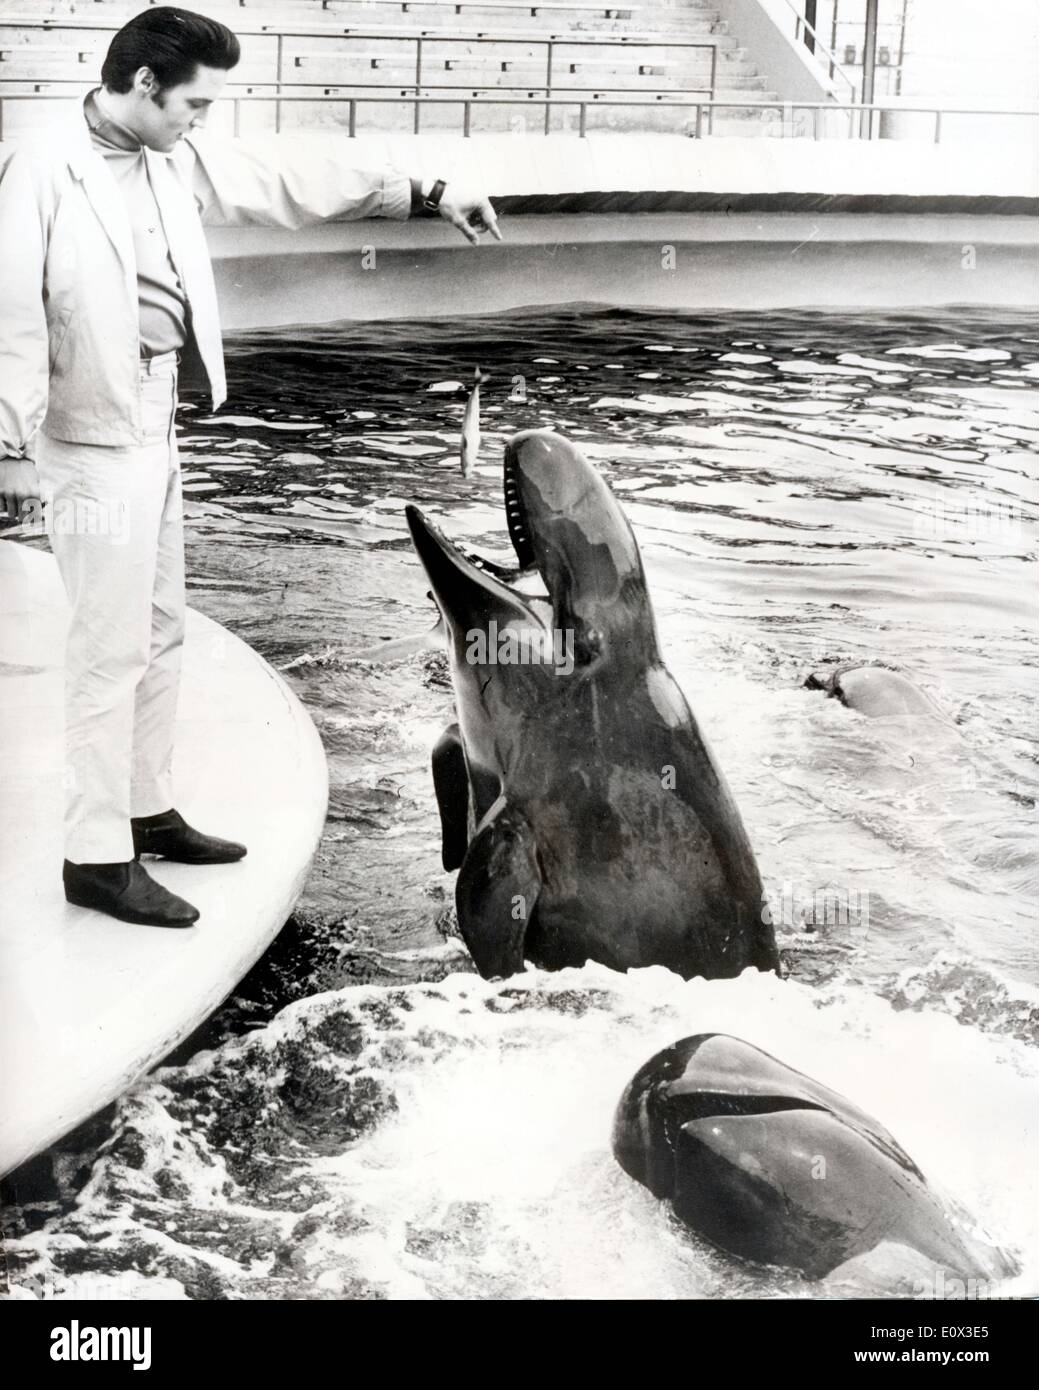 Elvis Presley feeding a whale at Maineland Aquarium - Stock Image